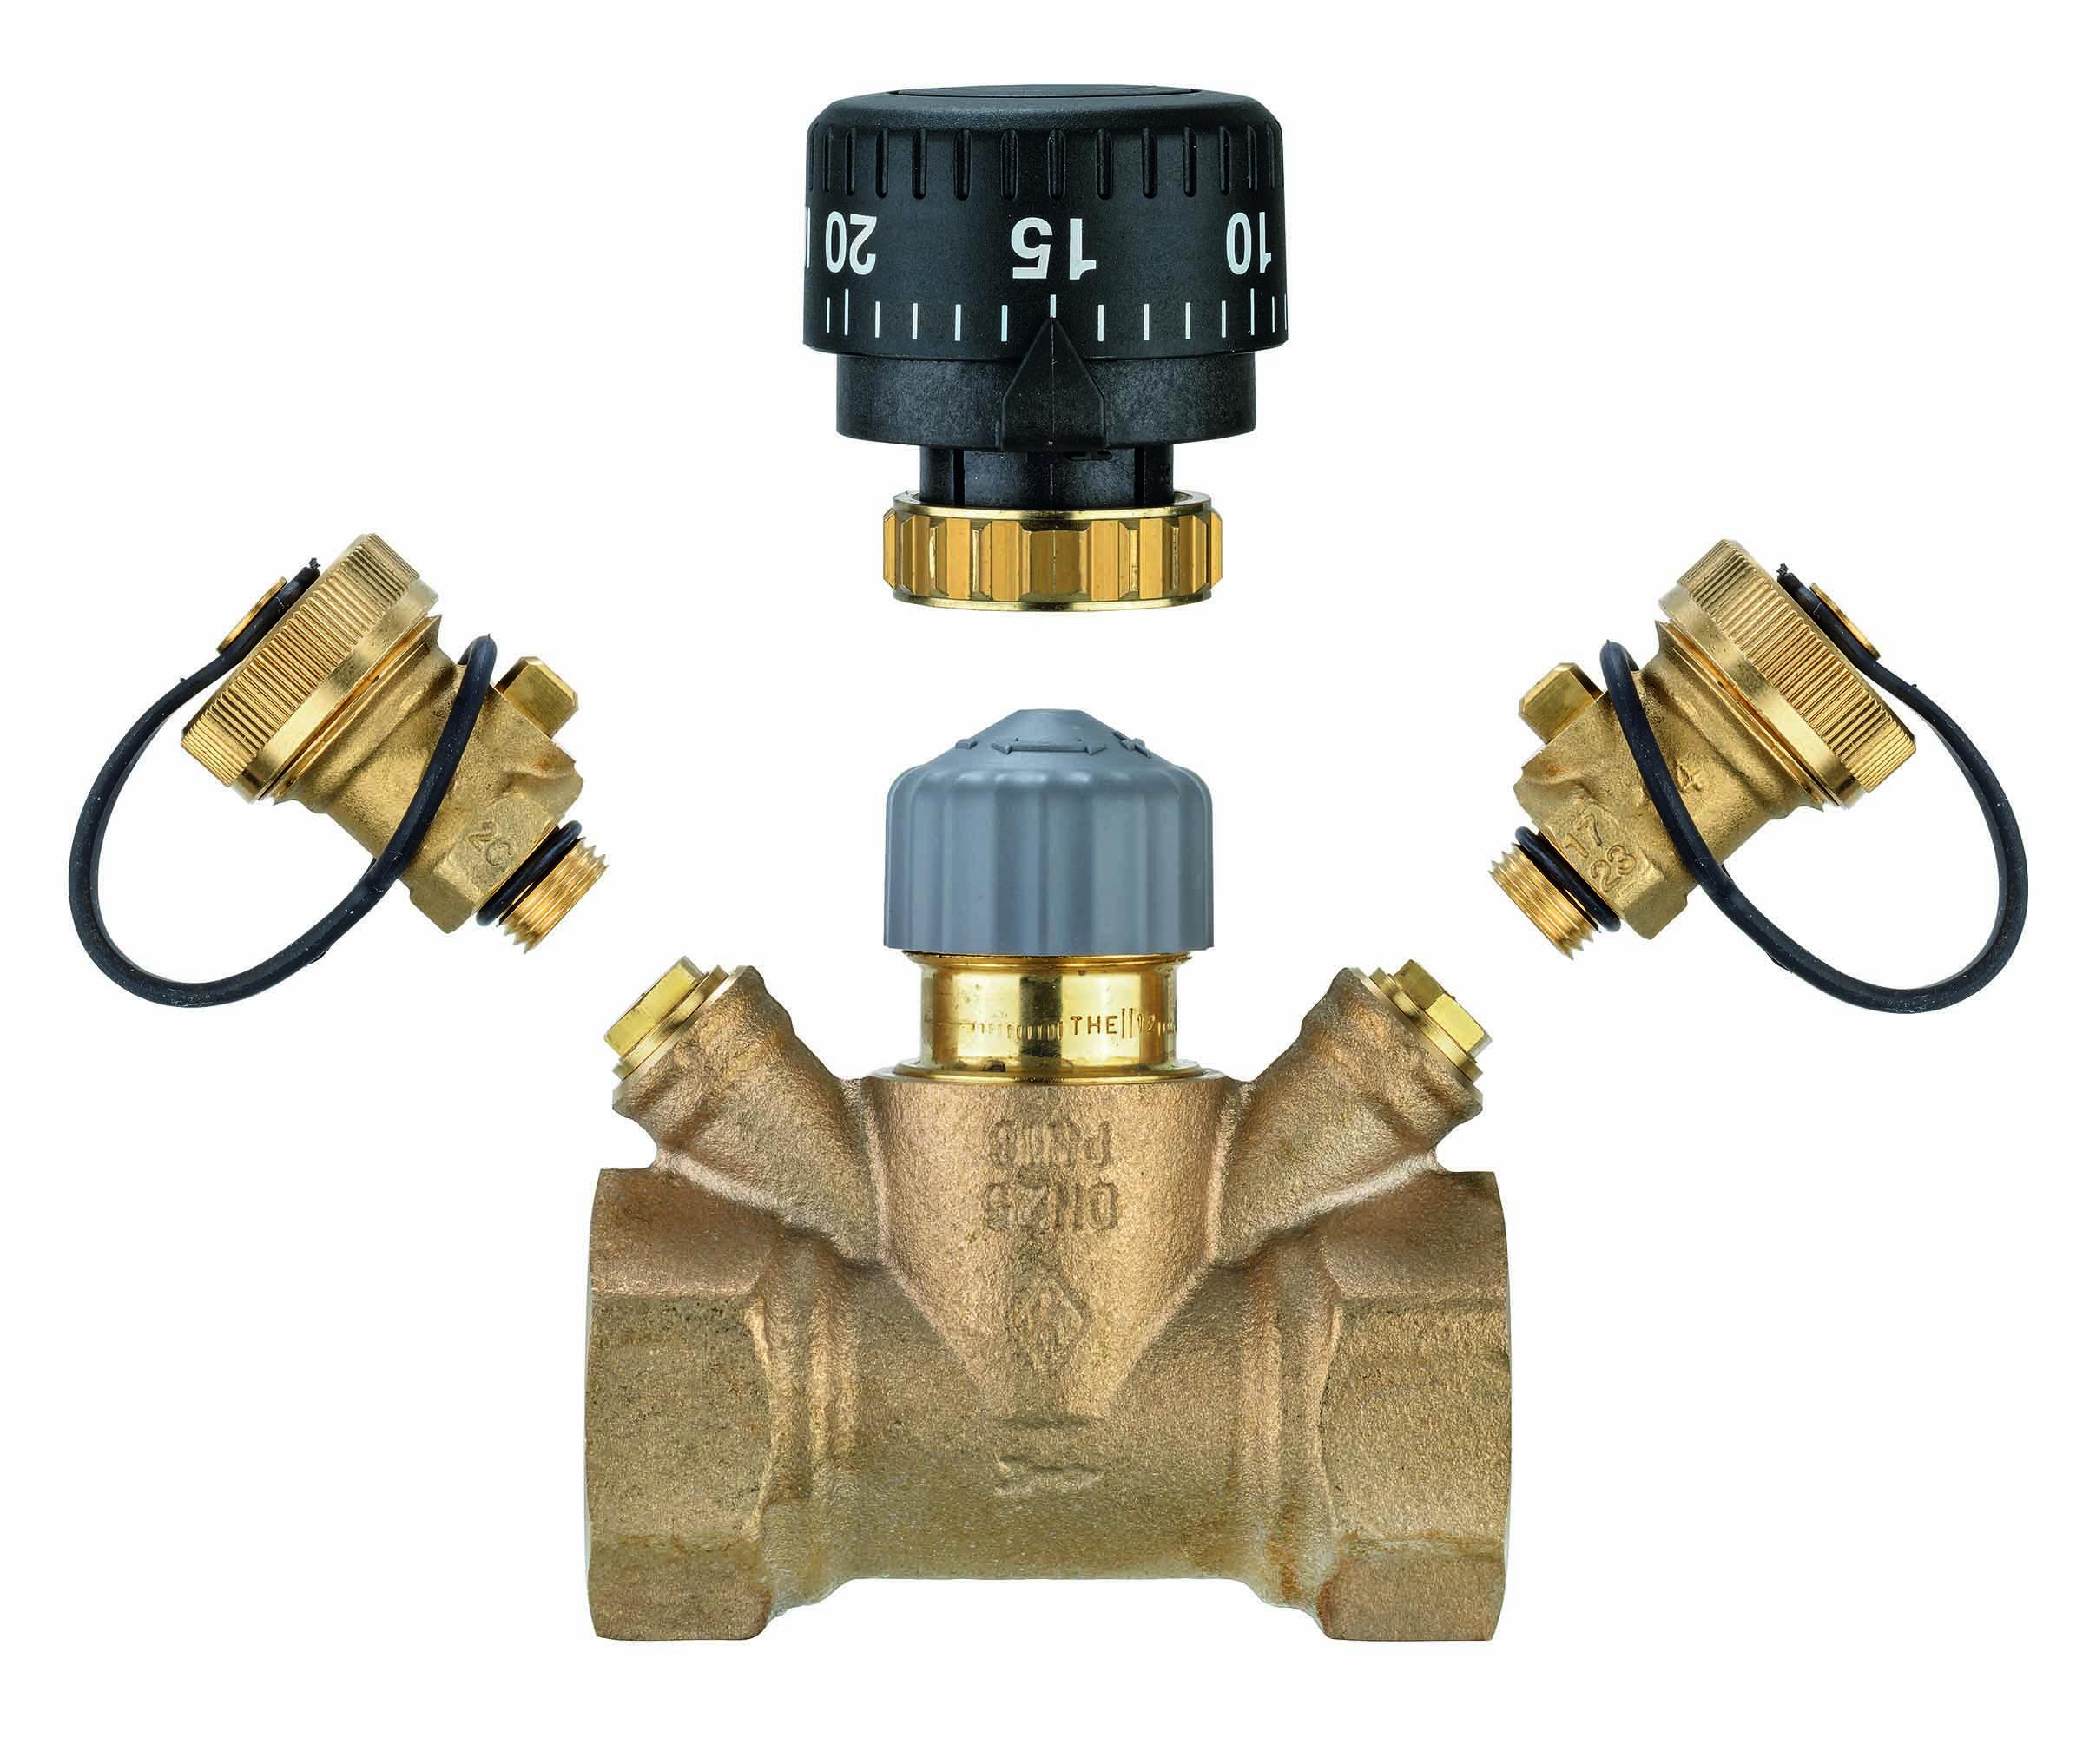 TA Strangregulierventil TA-Multi Set 1, DN 15, Handrad, 2x Entleerung / Messanschluss, Rotguss- STLB-Bau Mustervorlage -